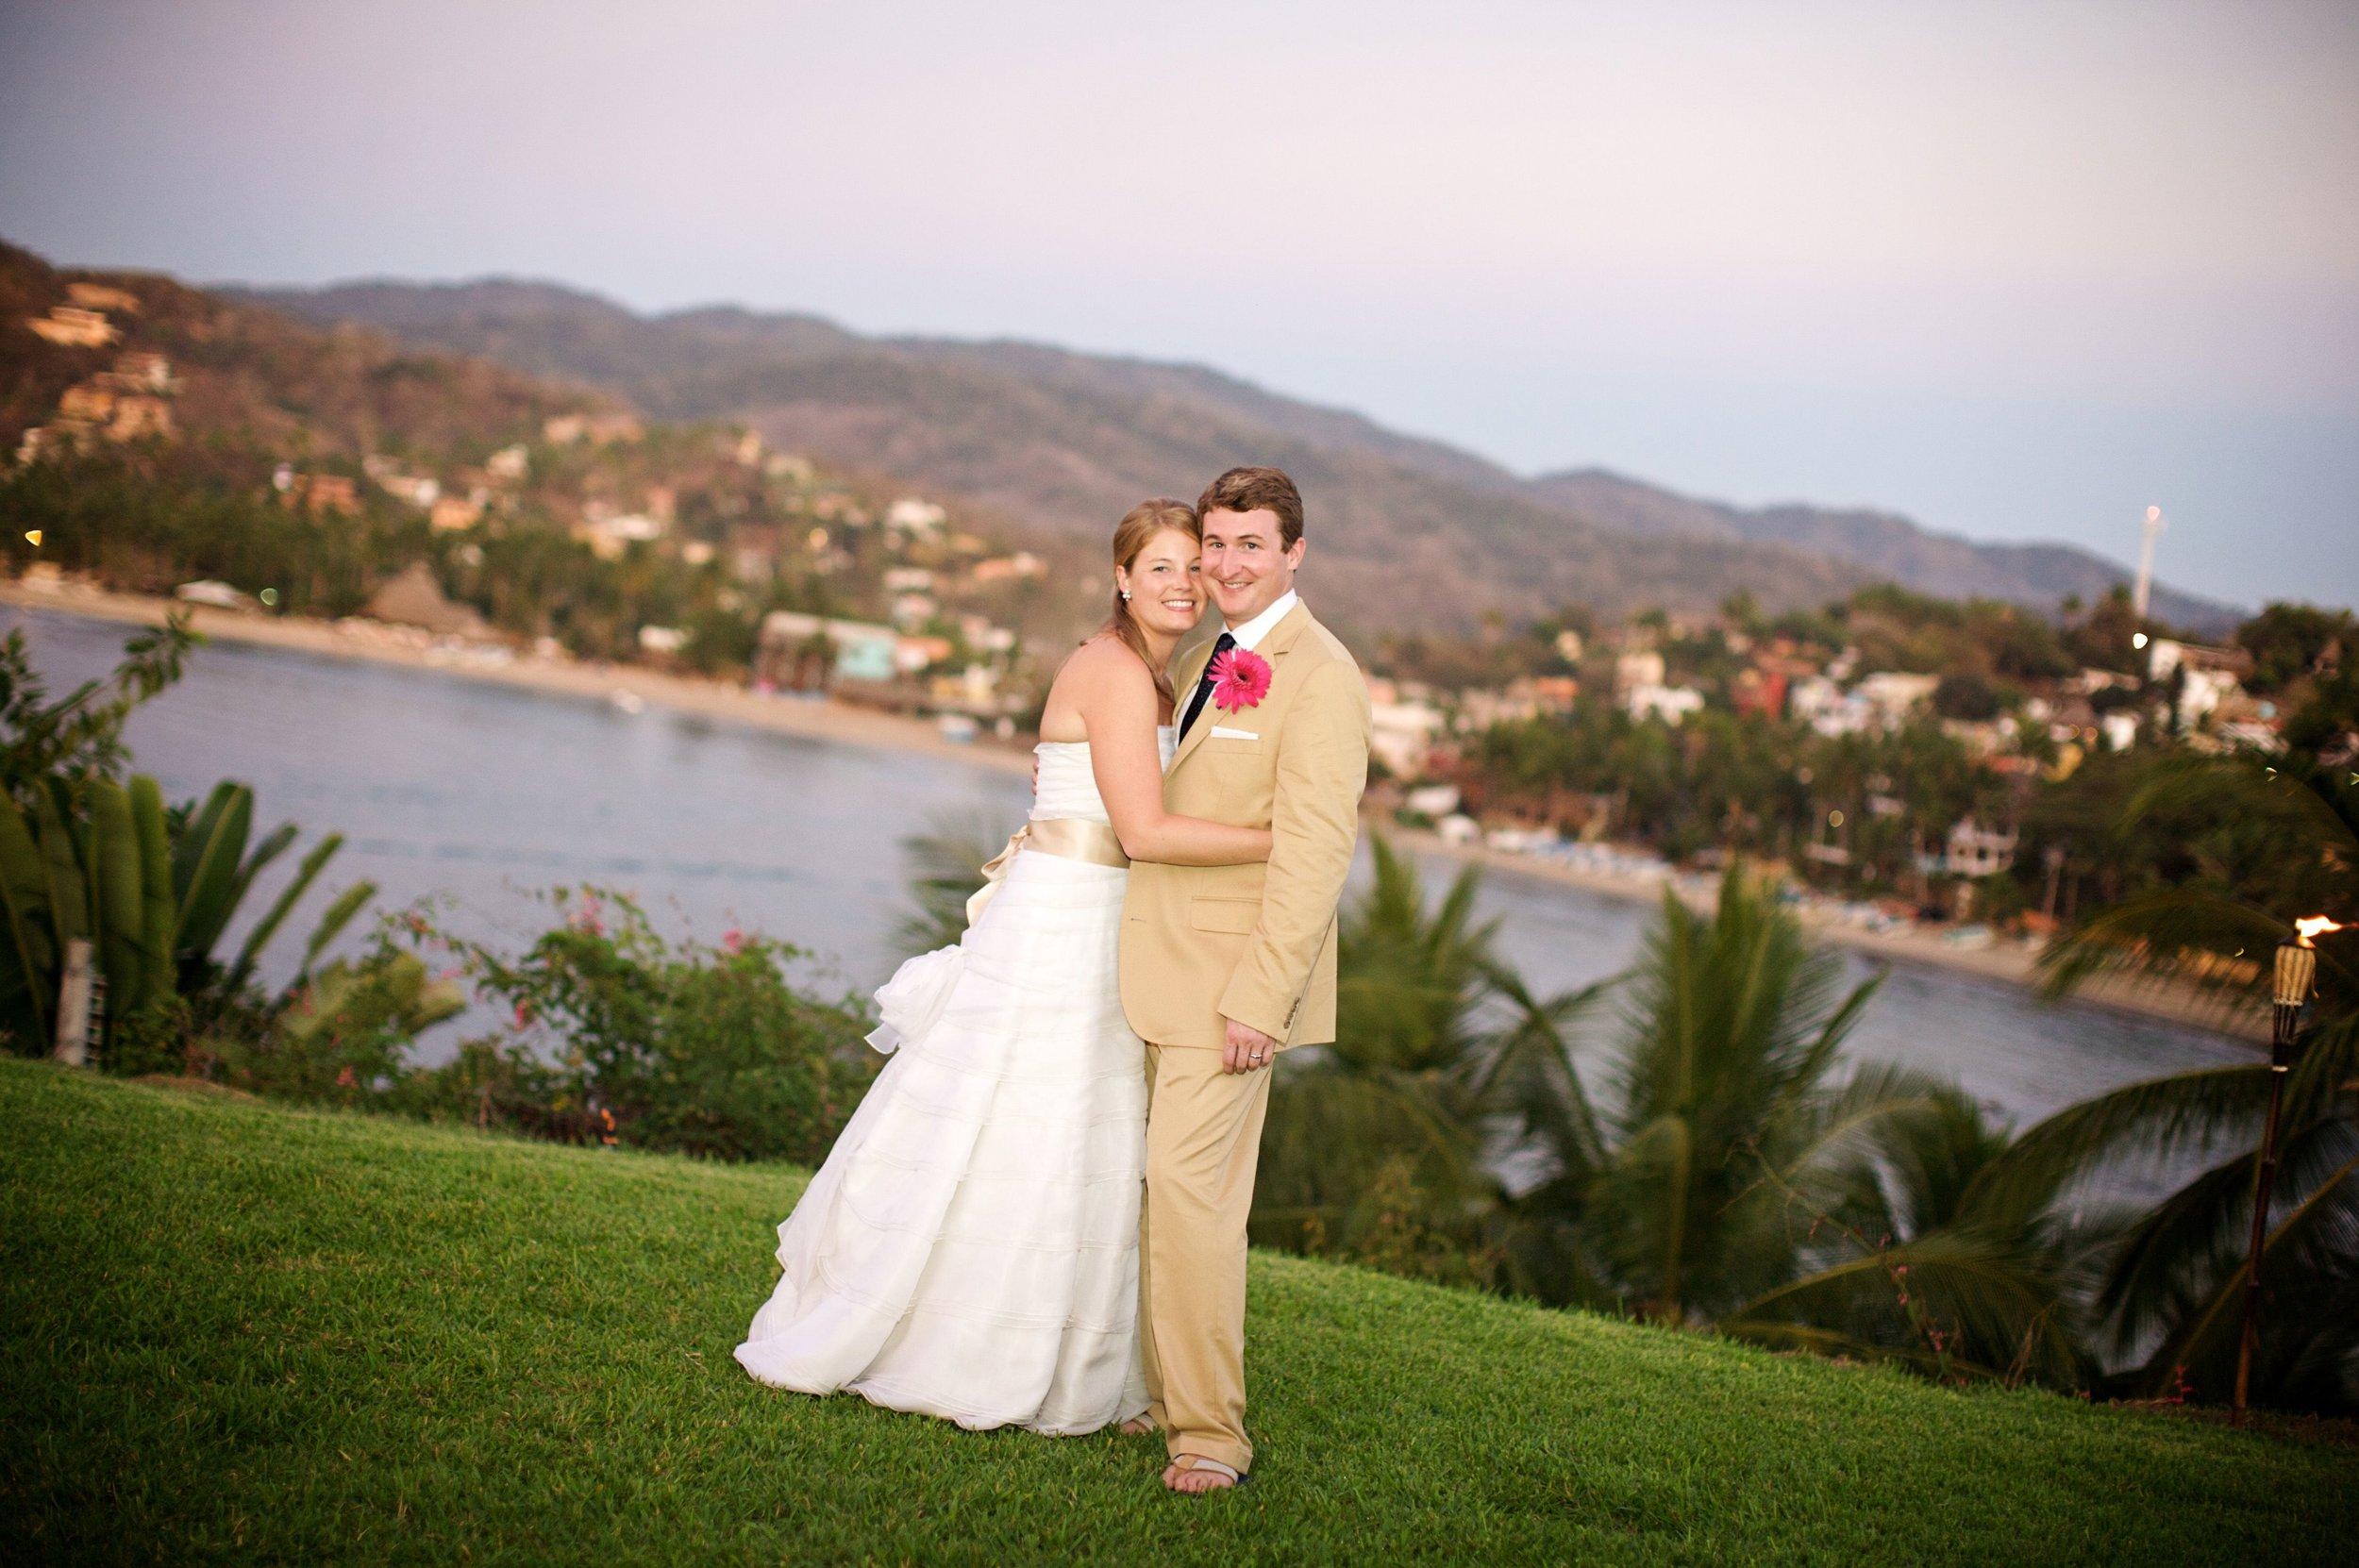 katy-casey-wedding-221.jpg